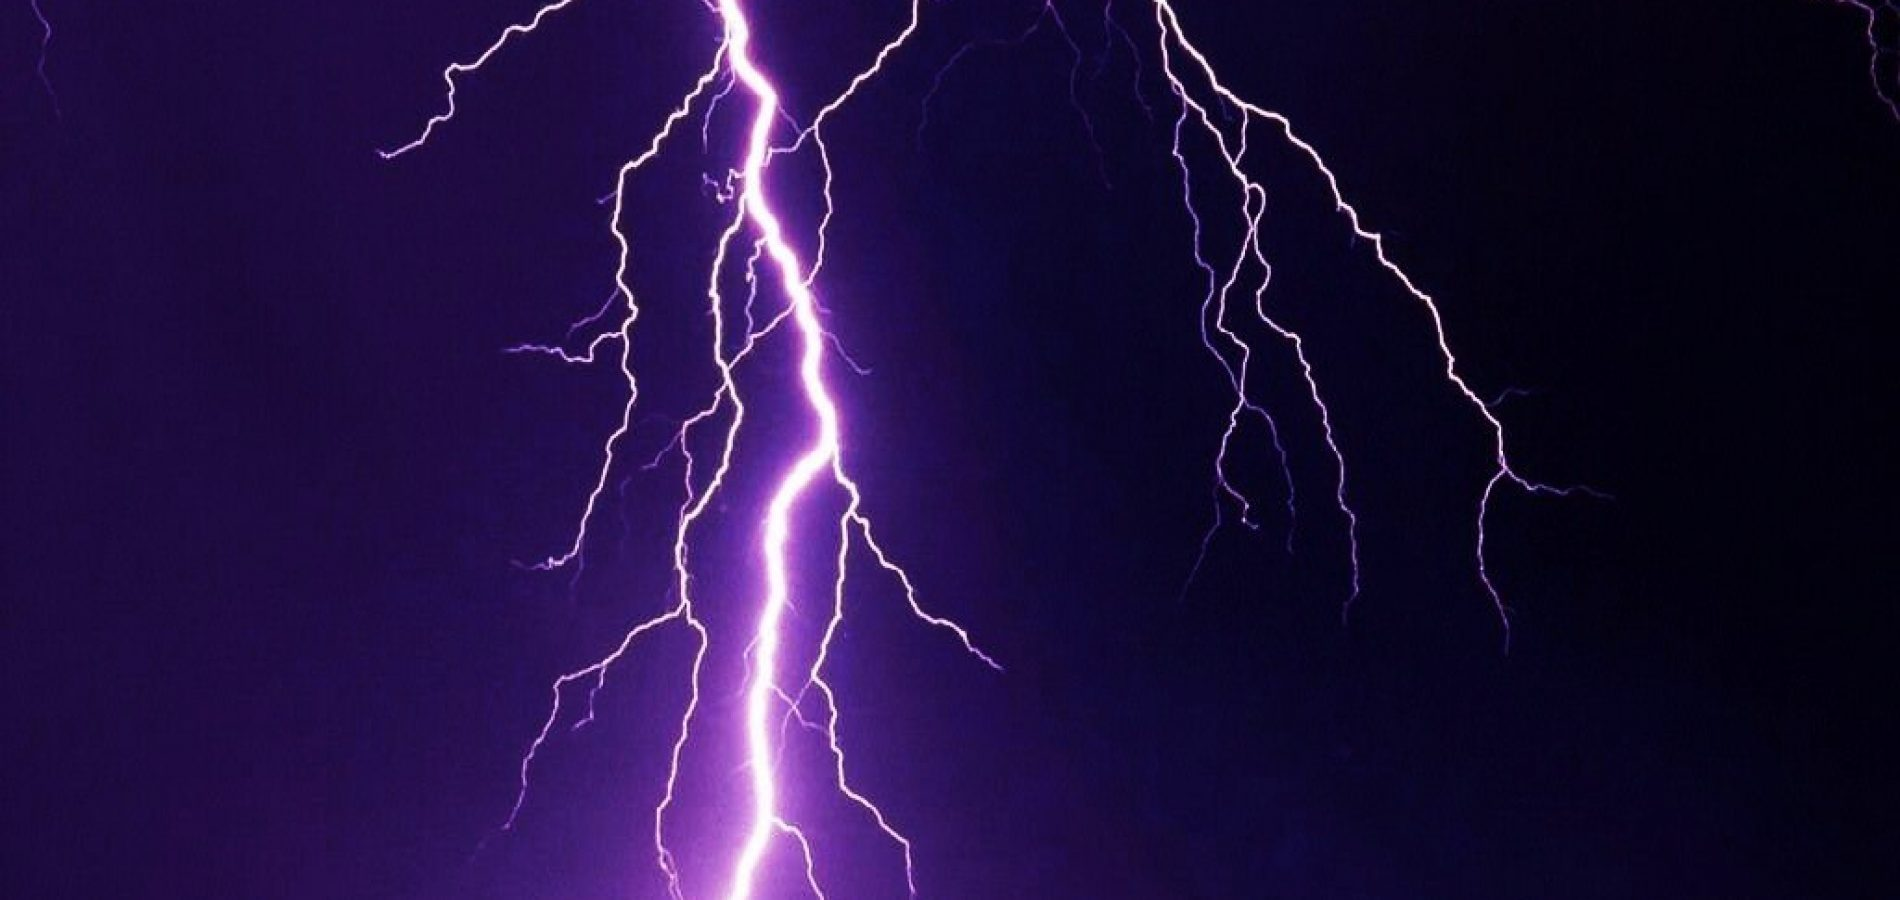 Eletrobras Piauí explica cuidados durante tempestade de raios